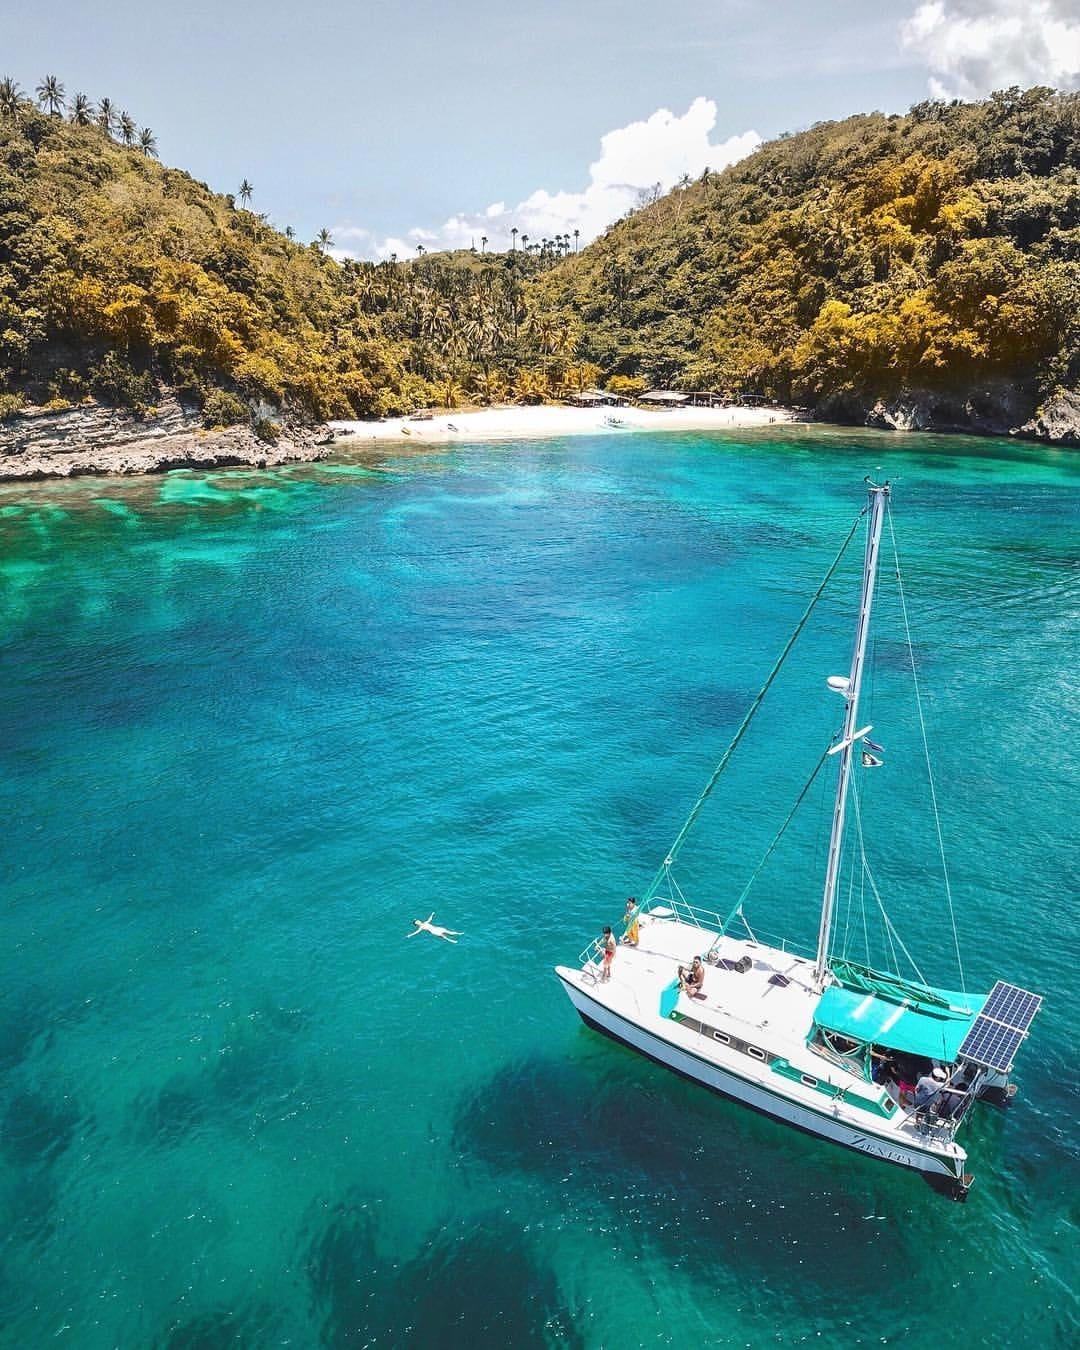 Haligi Beach,  things to do in Puerto Galera and Puerto Galera tourist spots